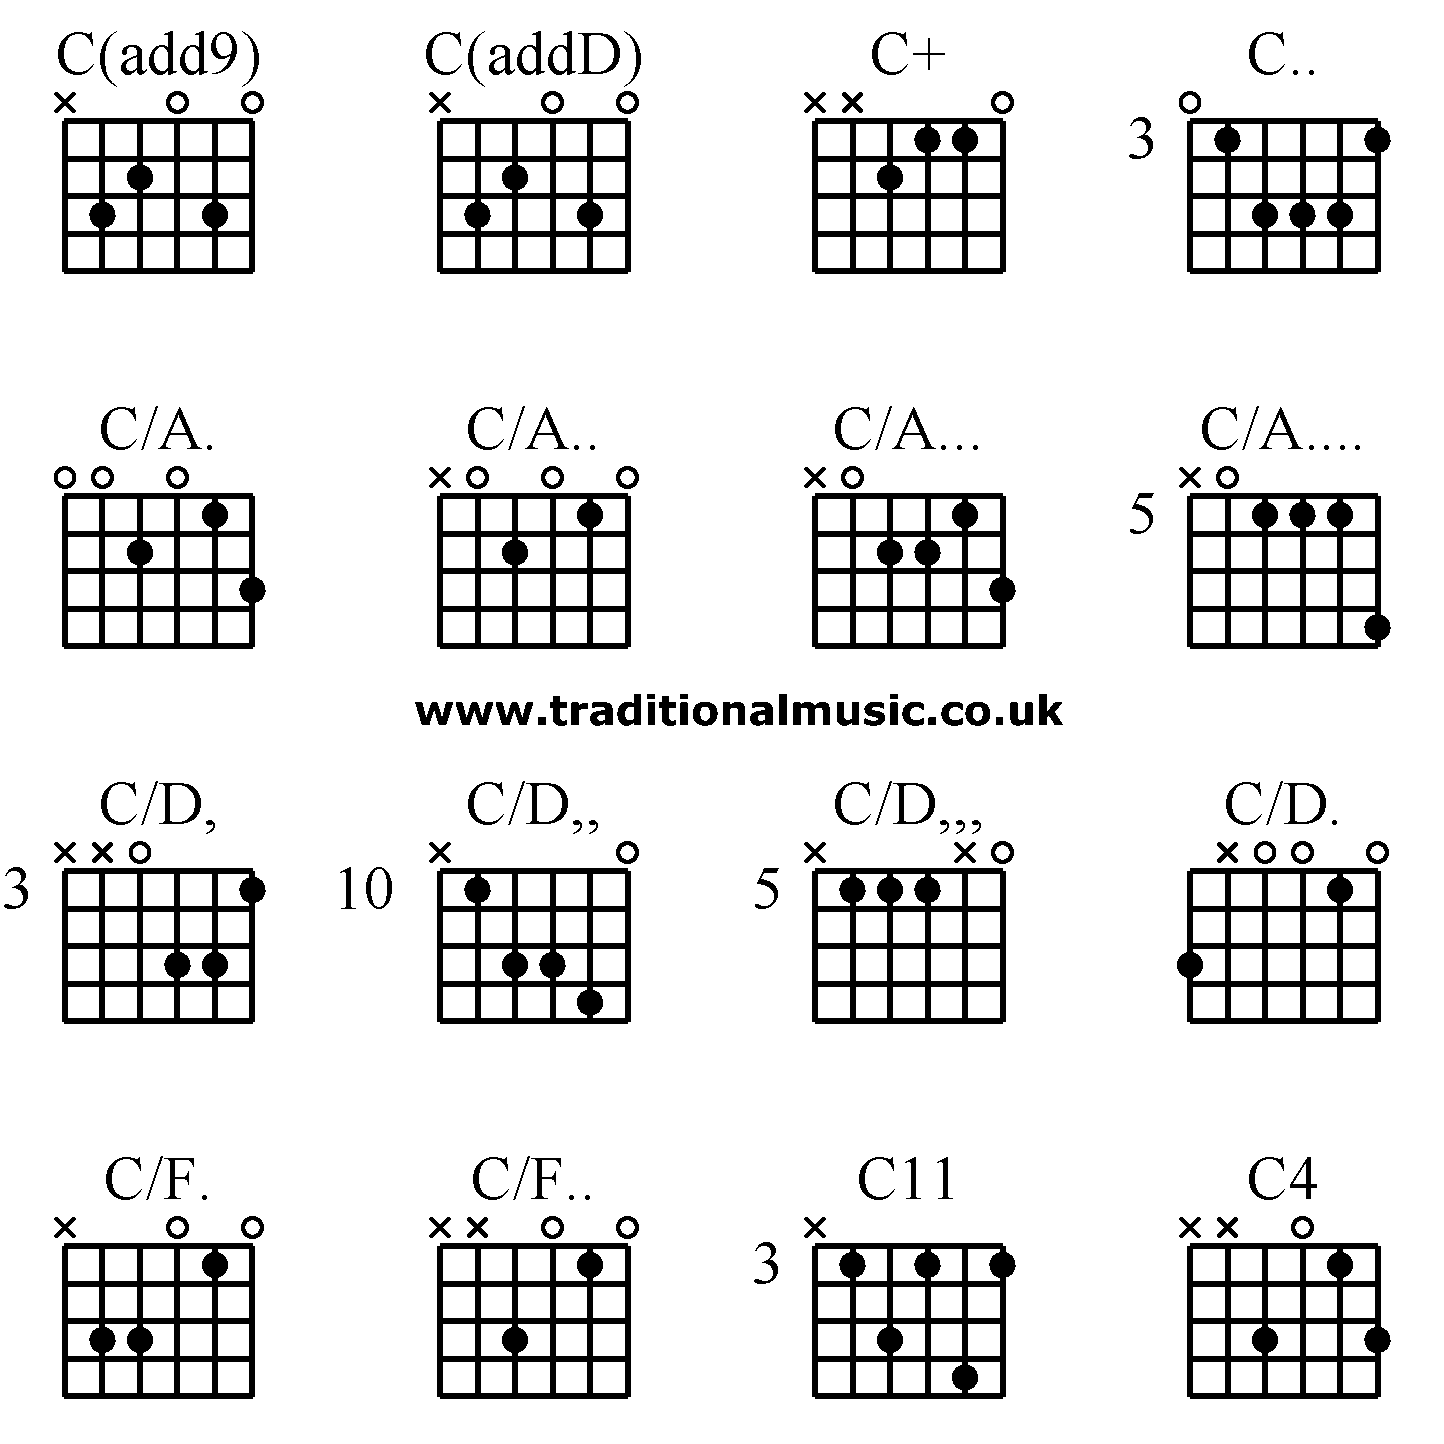 Advanced Guitar Chords C Add9 C Addd C C C A C A